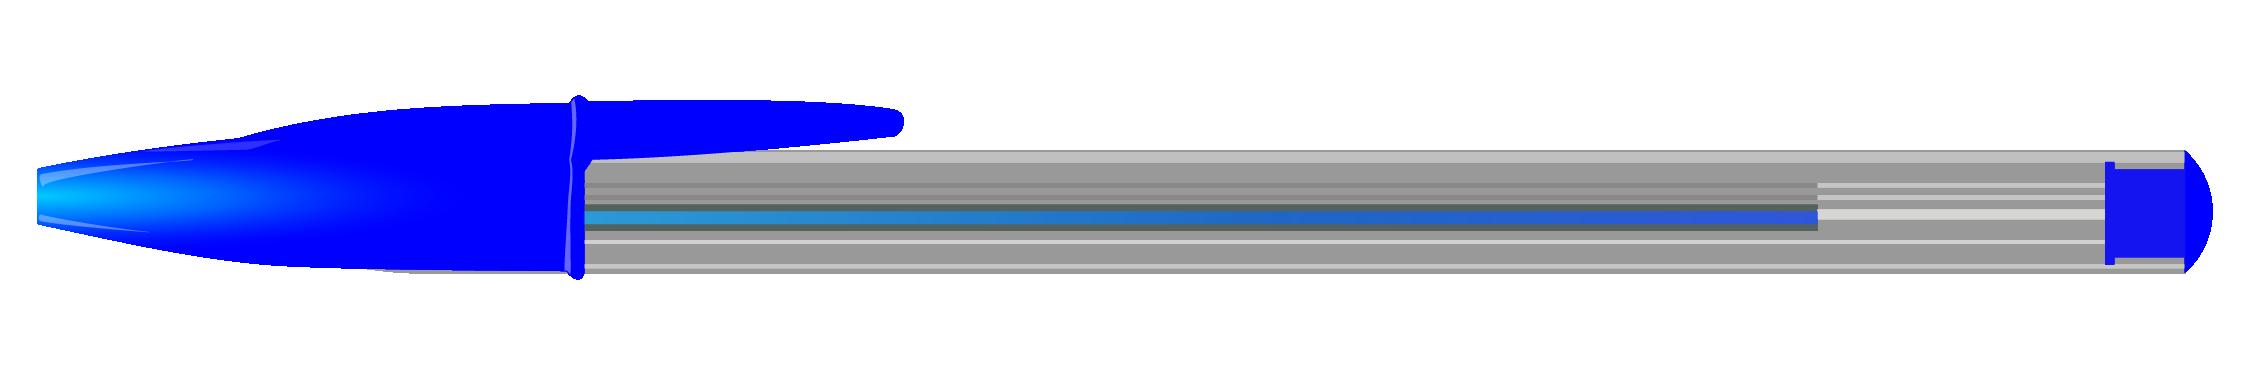 Stylo bleu